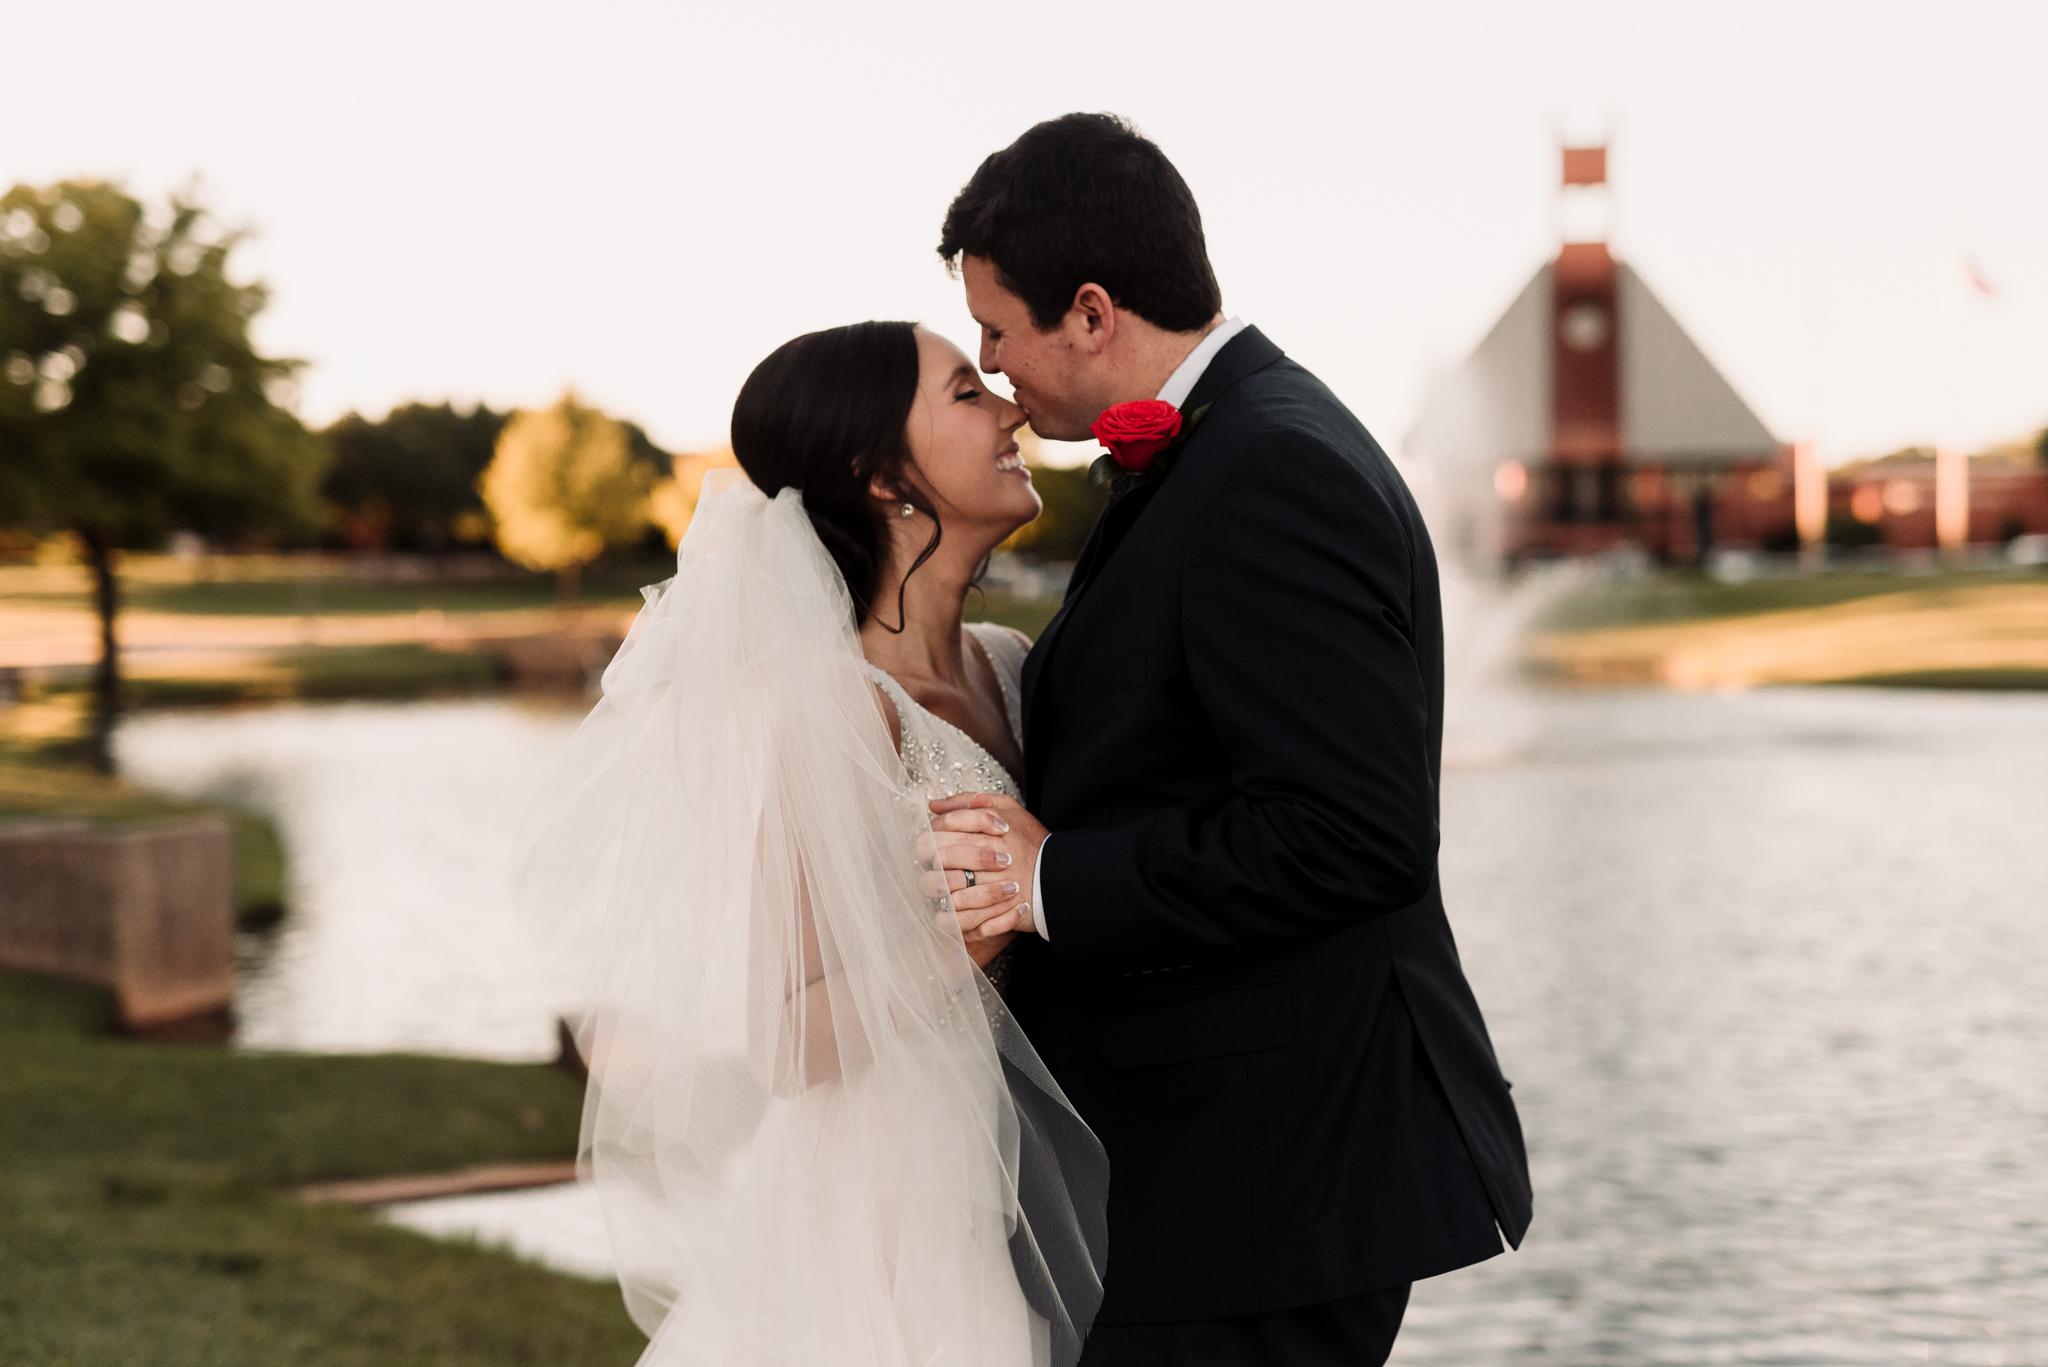 Oklahoma-Christian-University-Wedding-8846.jpg